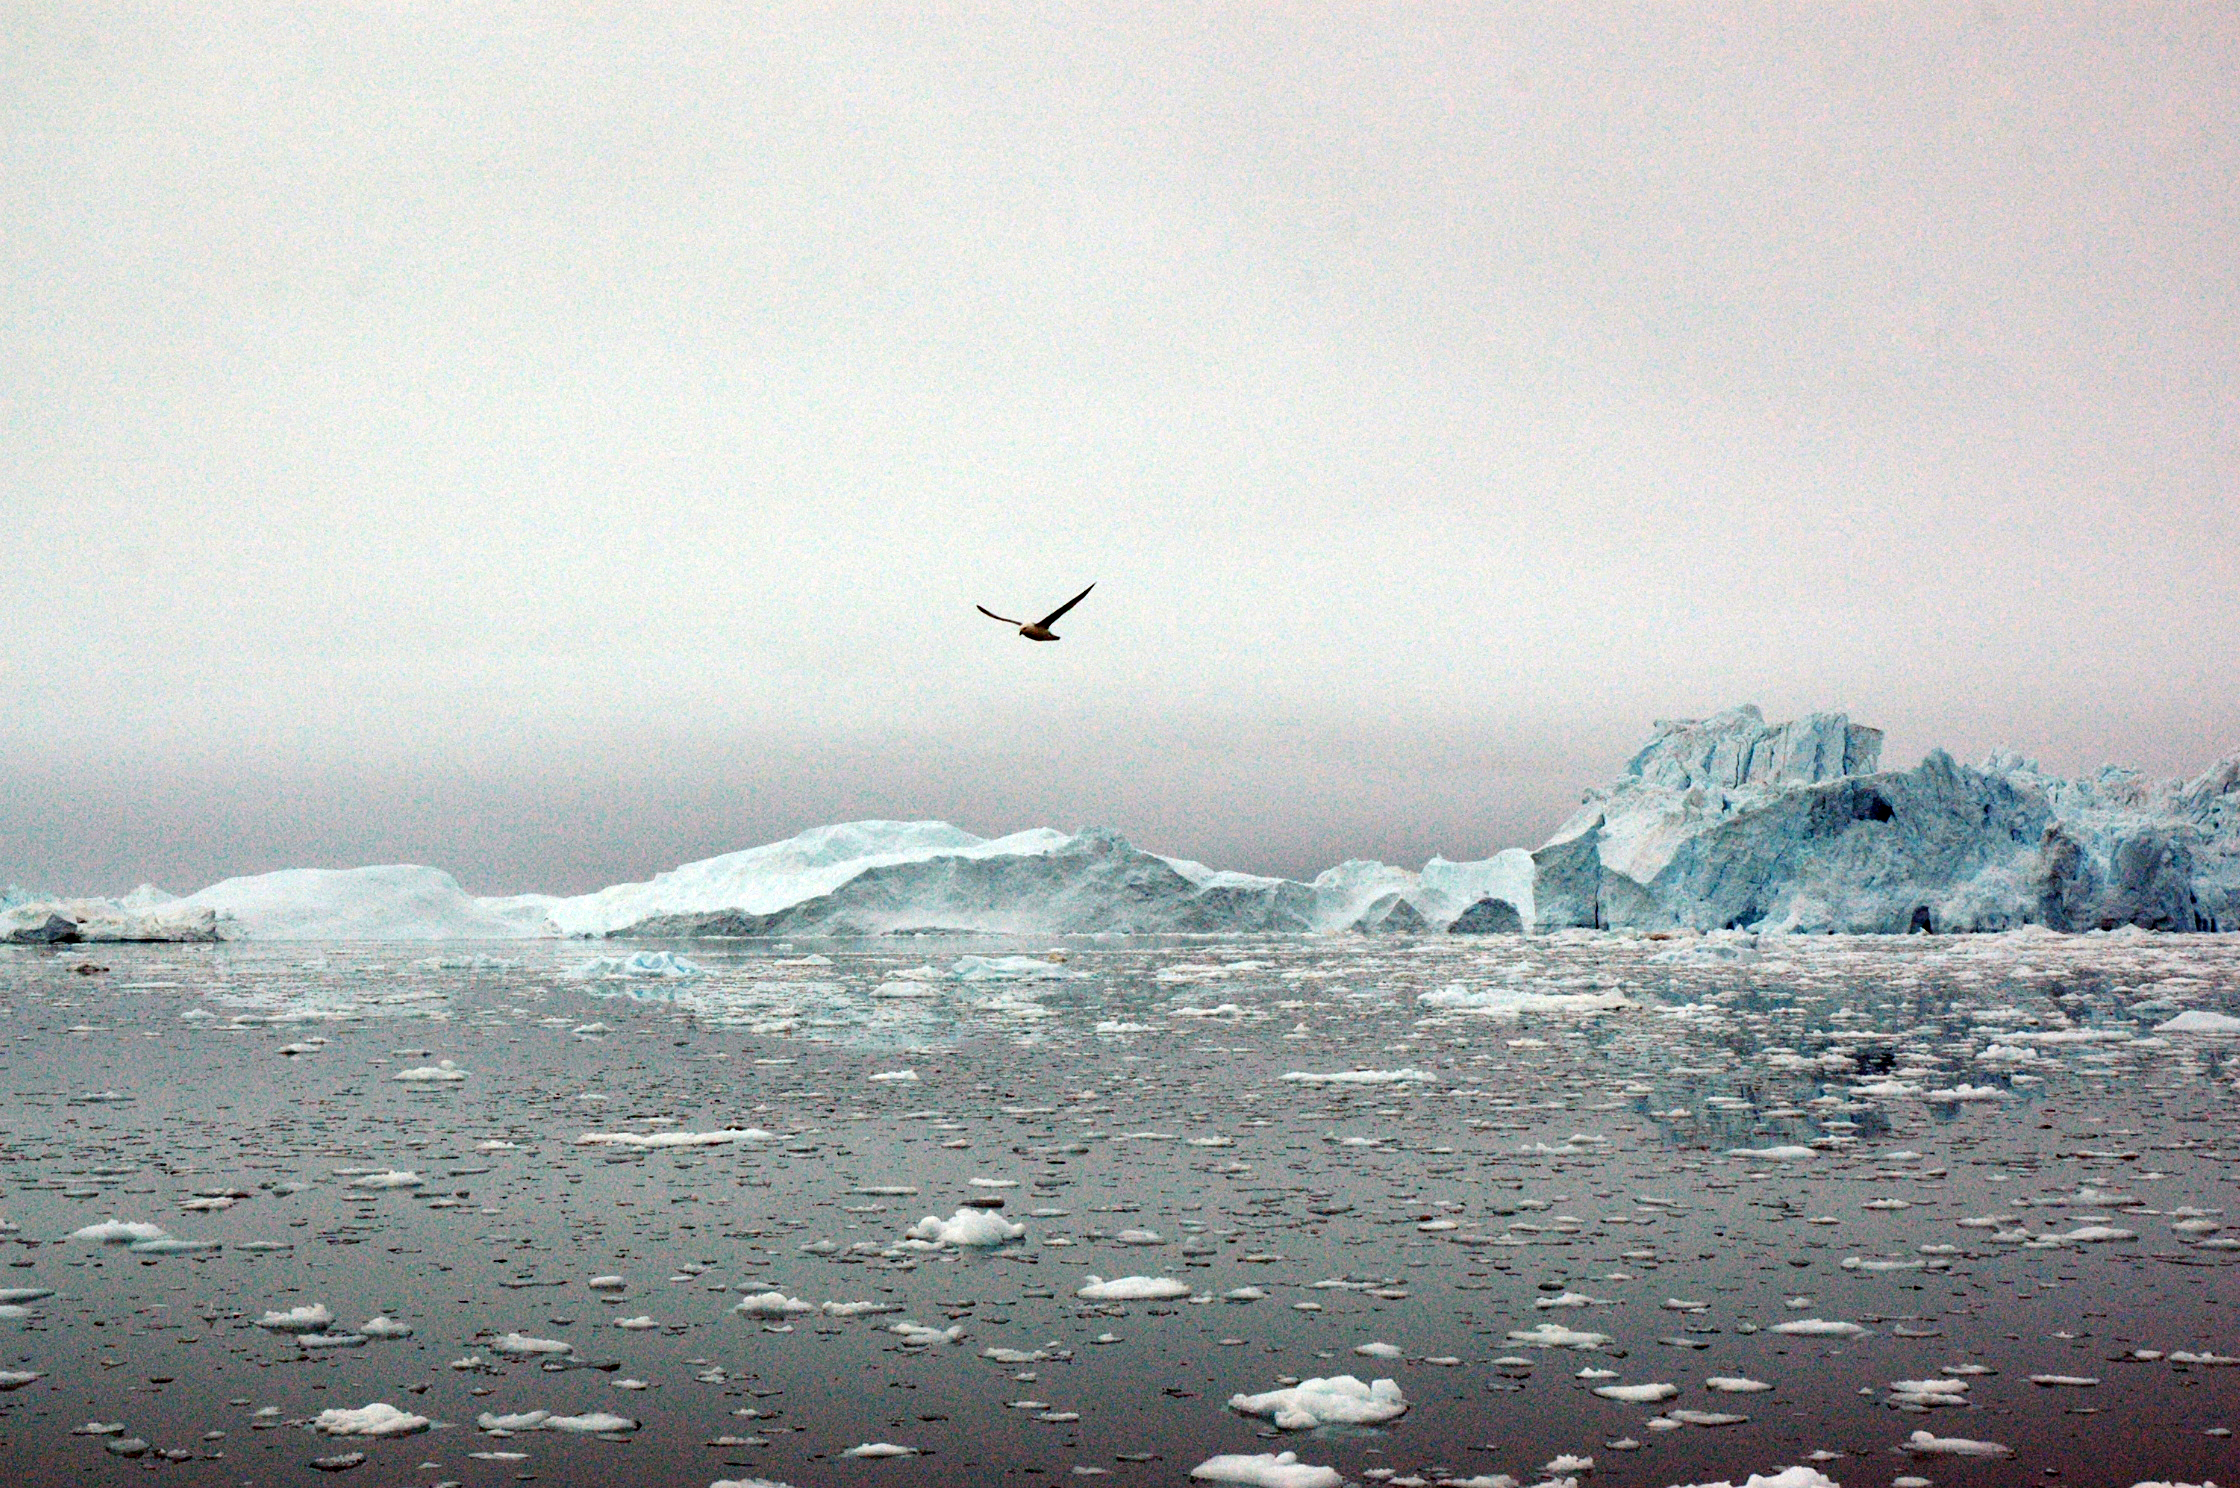 #1 Greenland